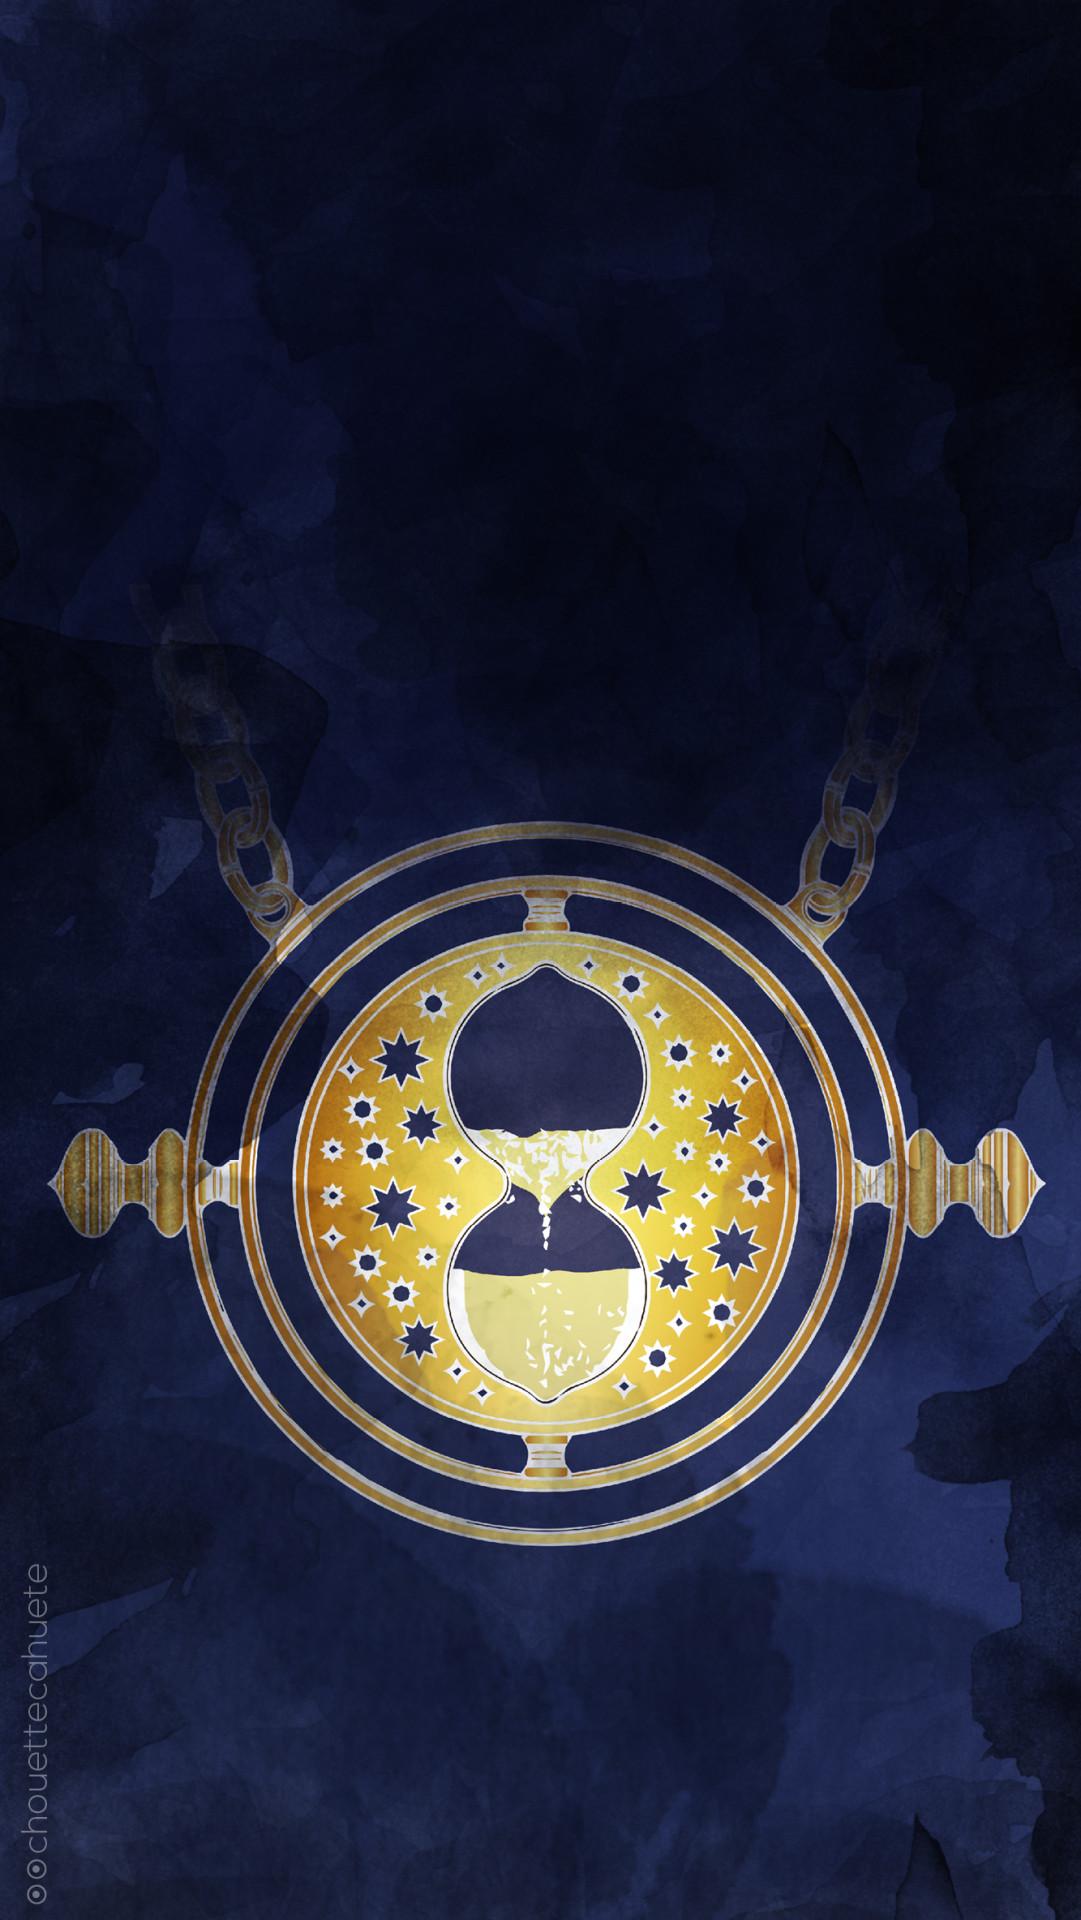 Hogwarts Iphone Wallpaper 62 Images